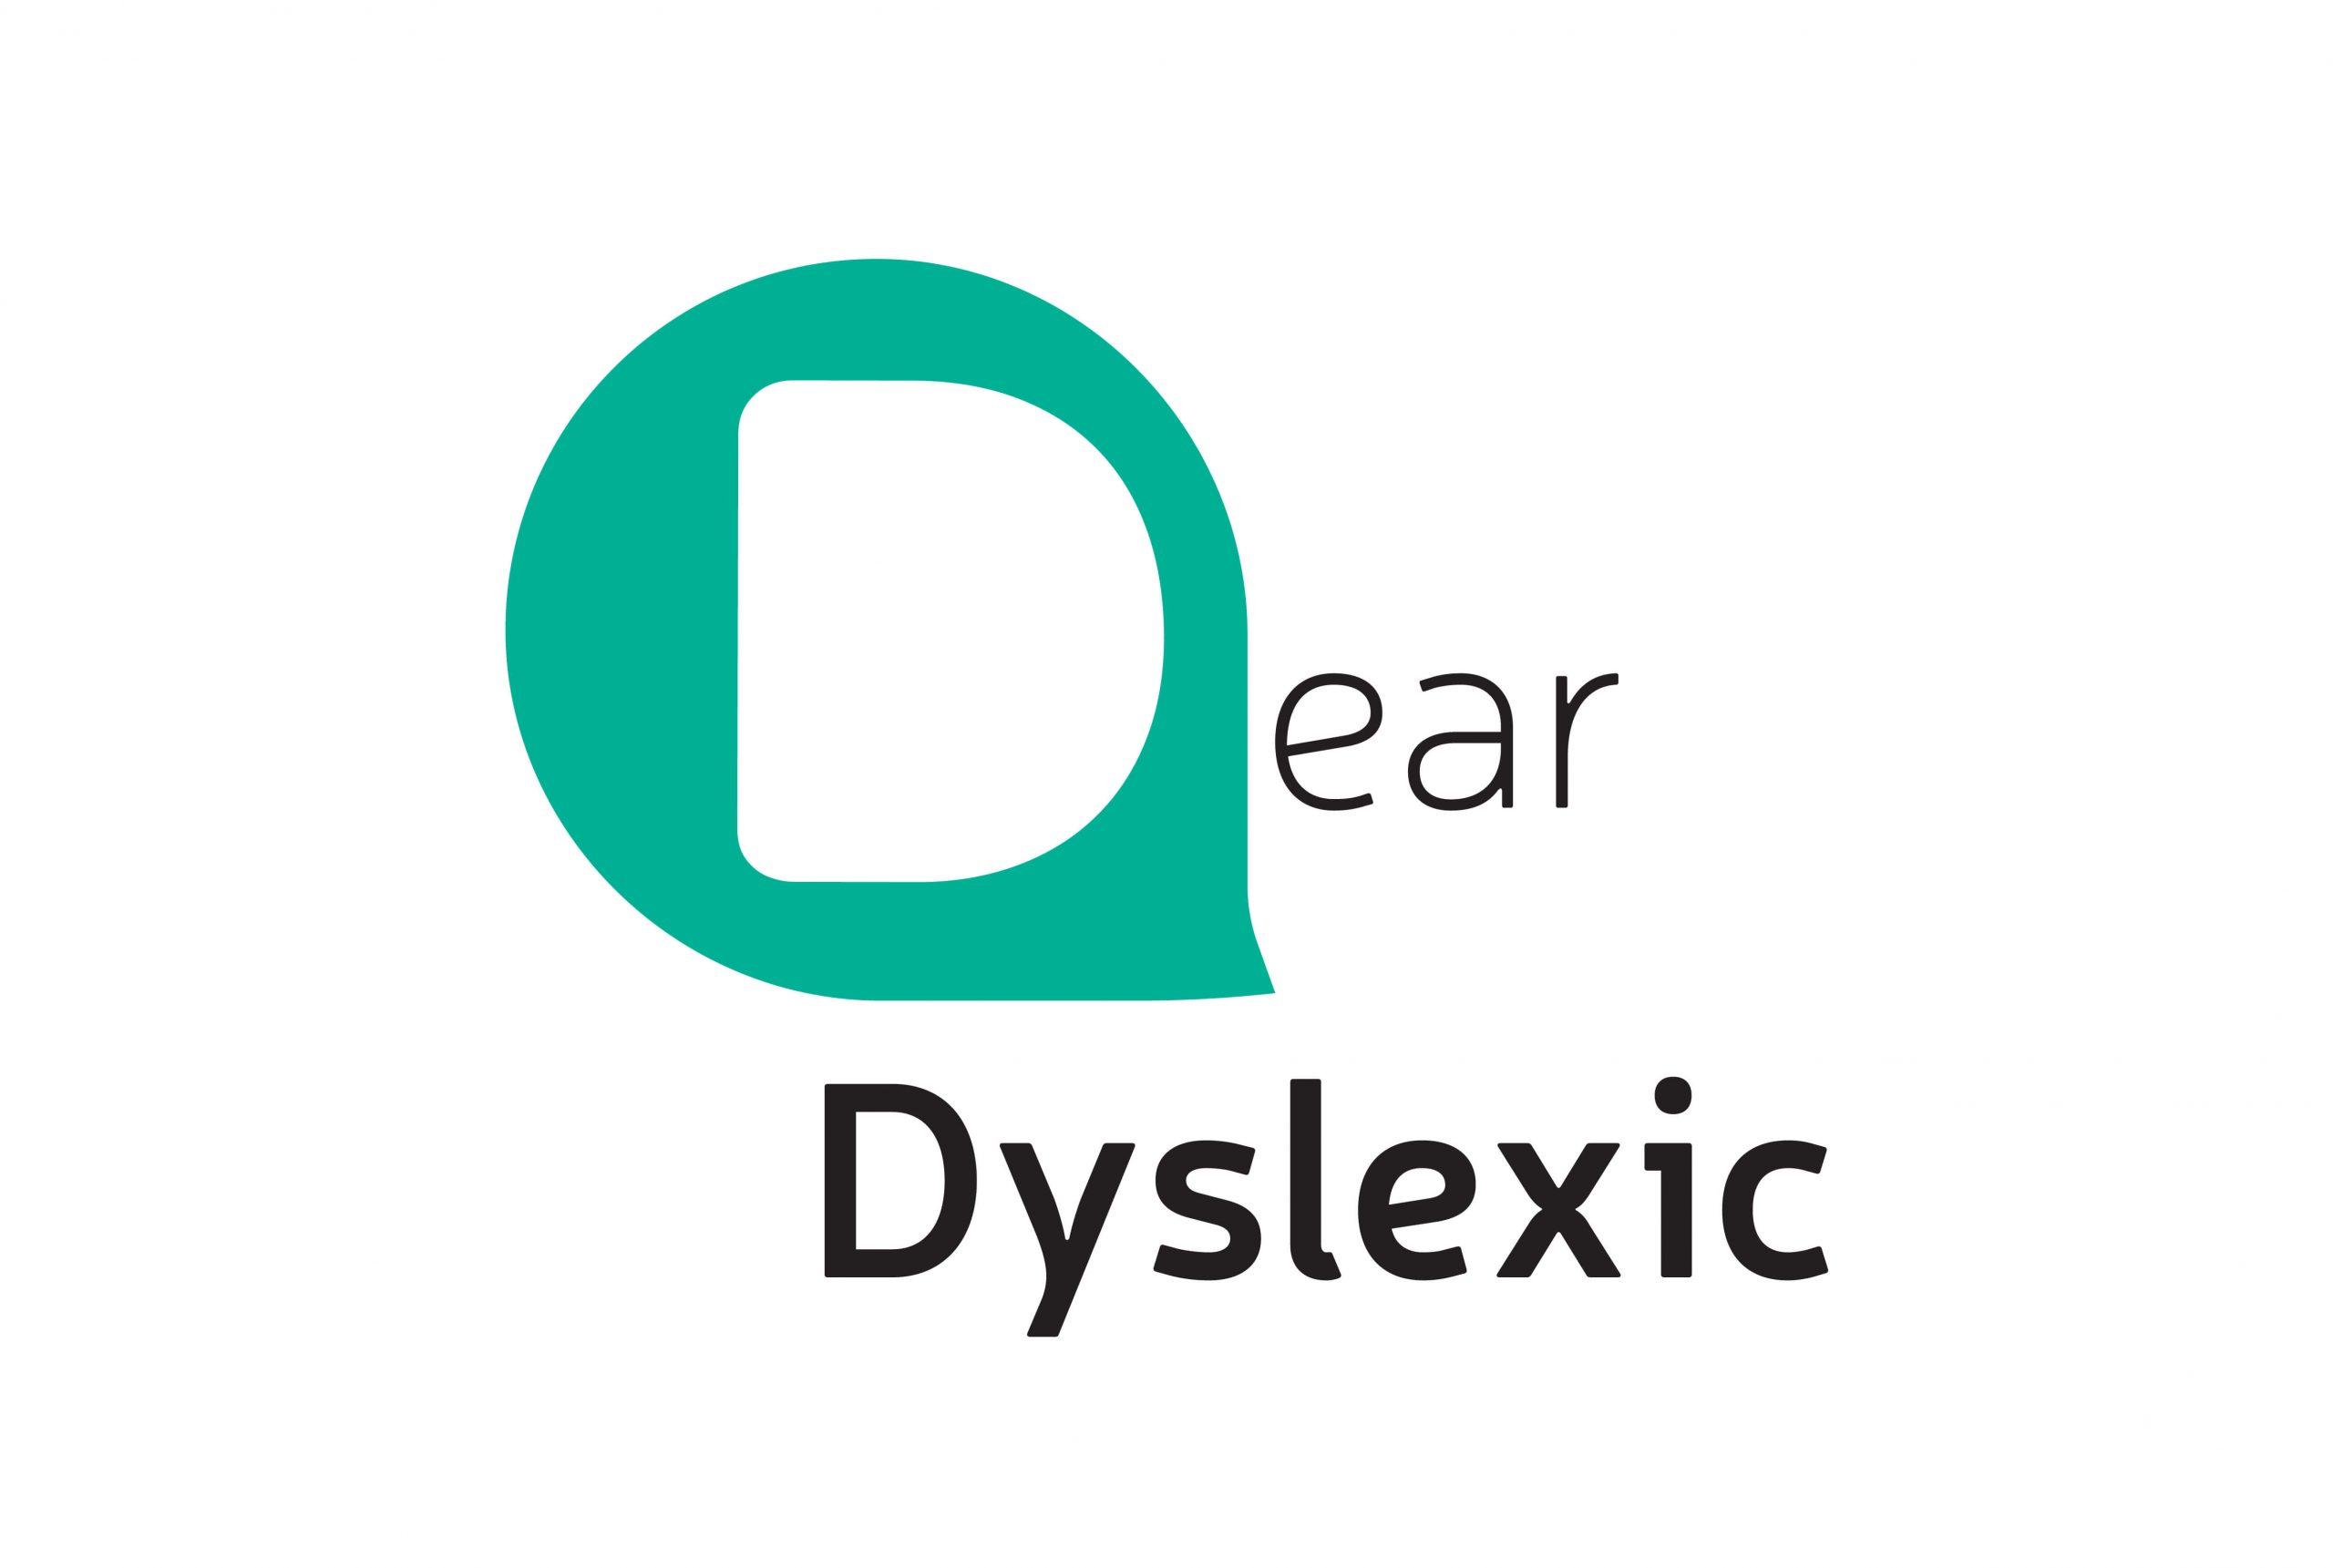 Dear Dyslexic logo